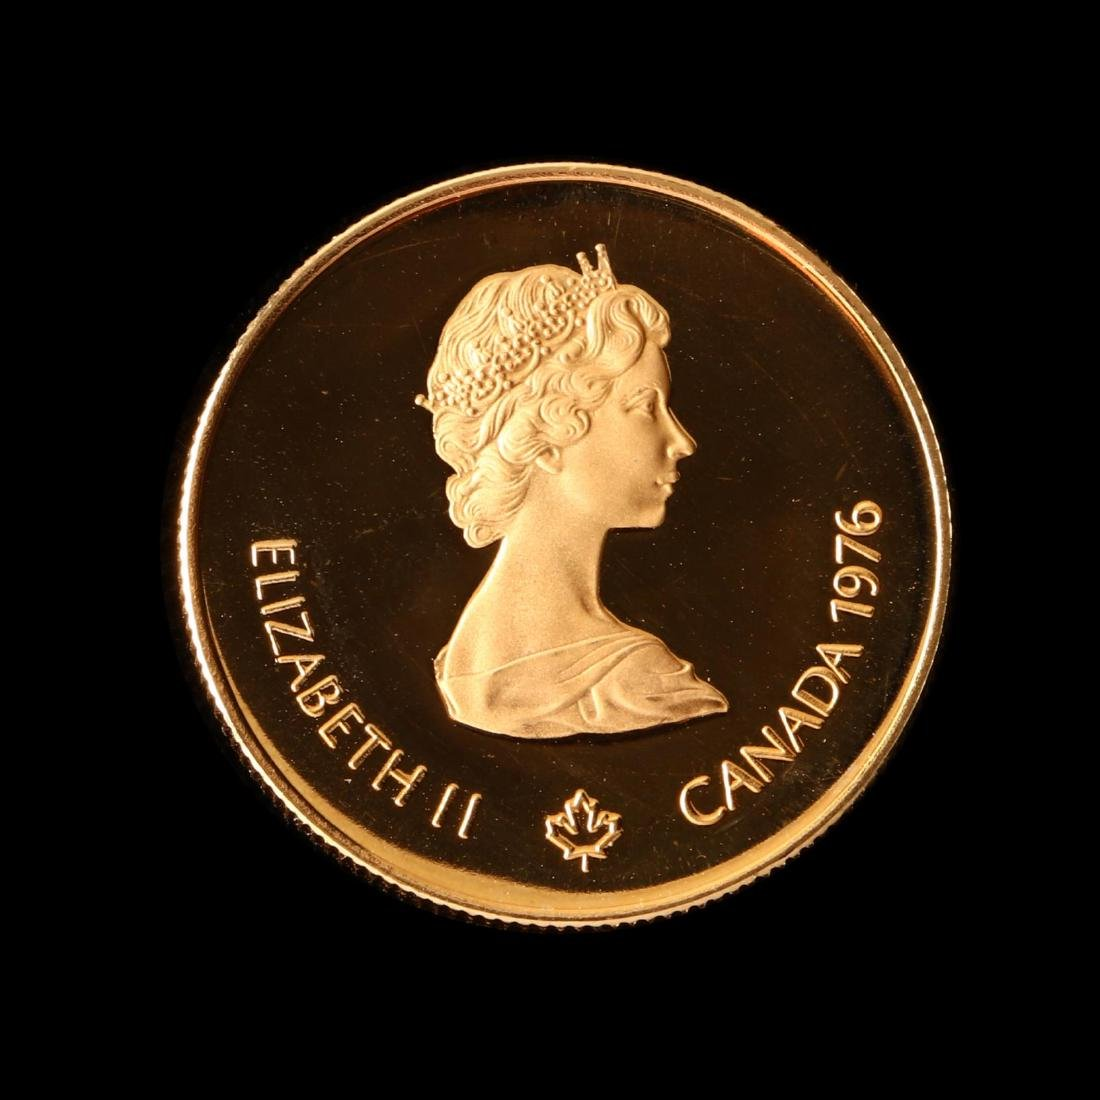 Canada, 1976 XXI Olympiad $100 Proof Half Ounce Gold